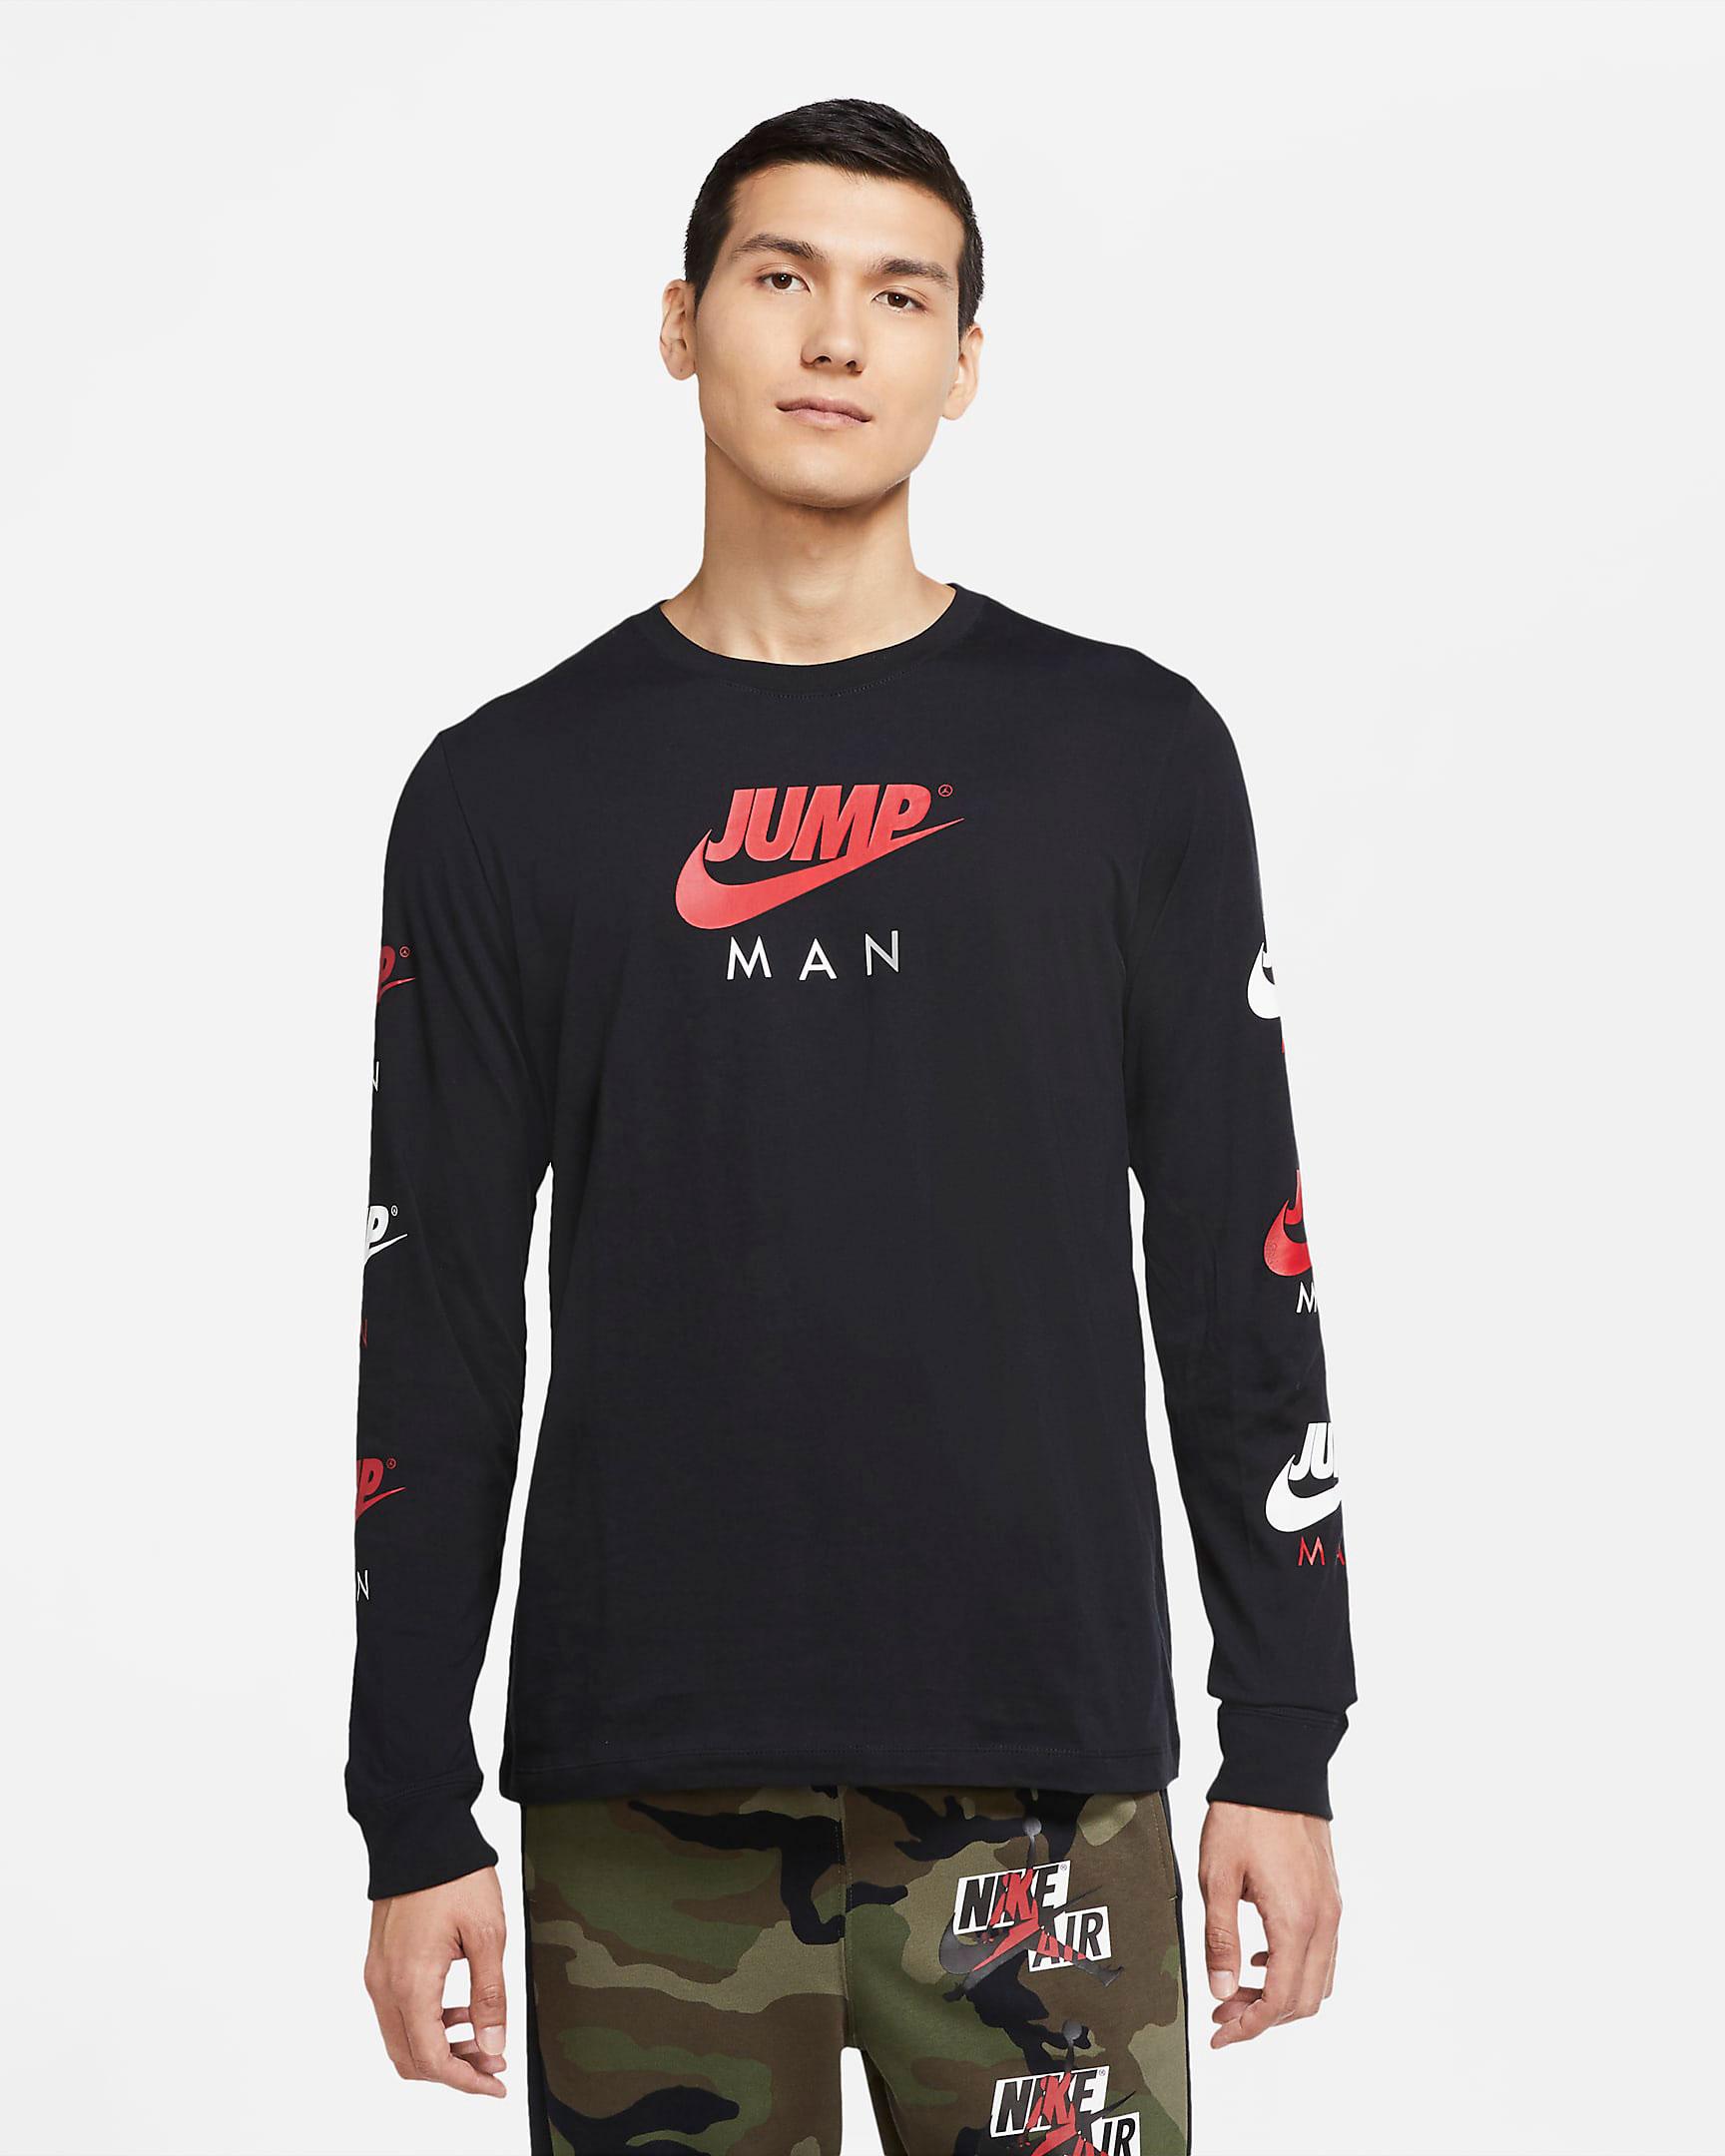 jordan-jumpman-long-sleeve-shirt-black-white-red